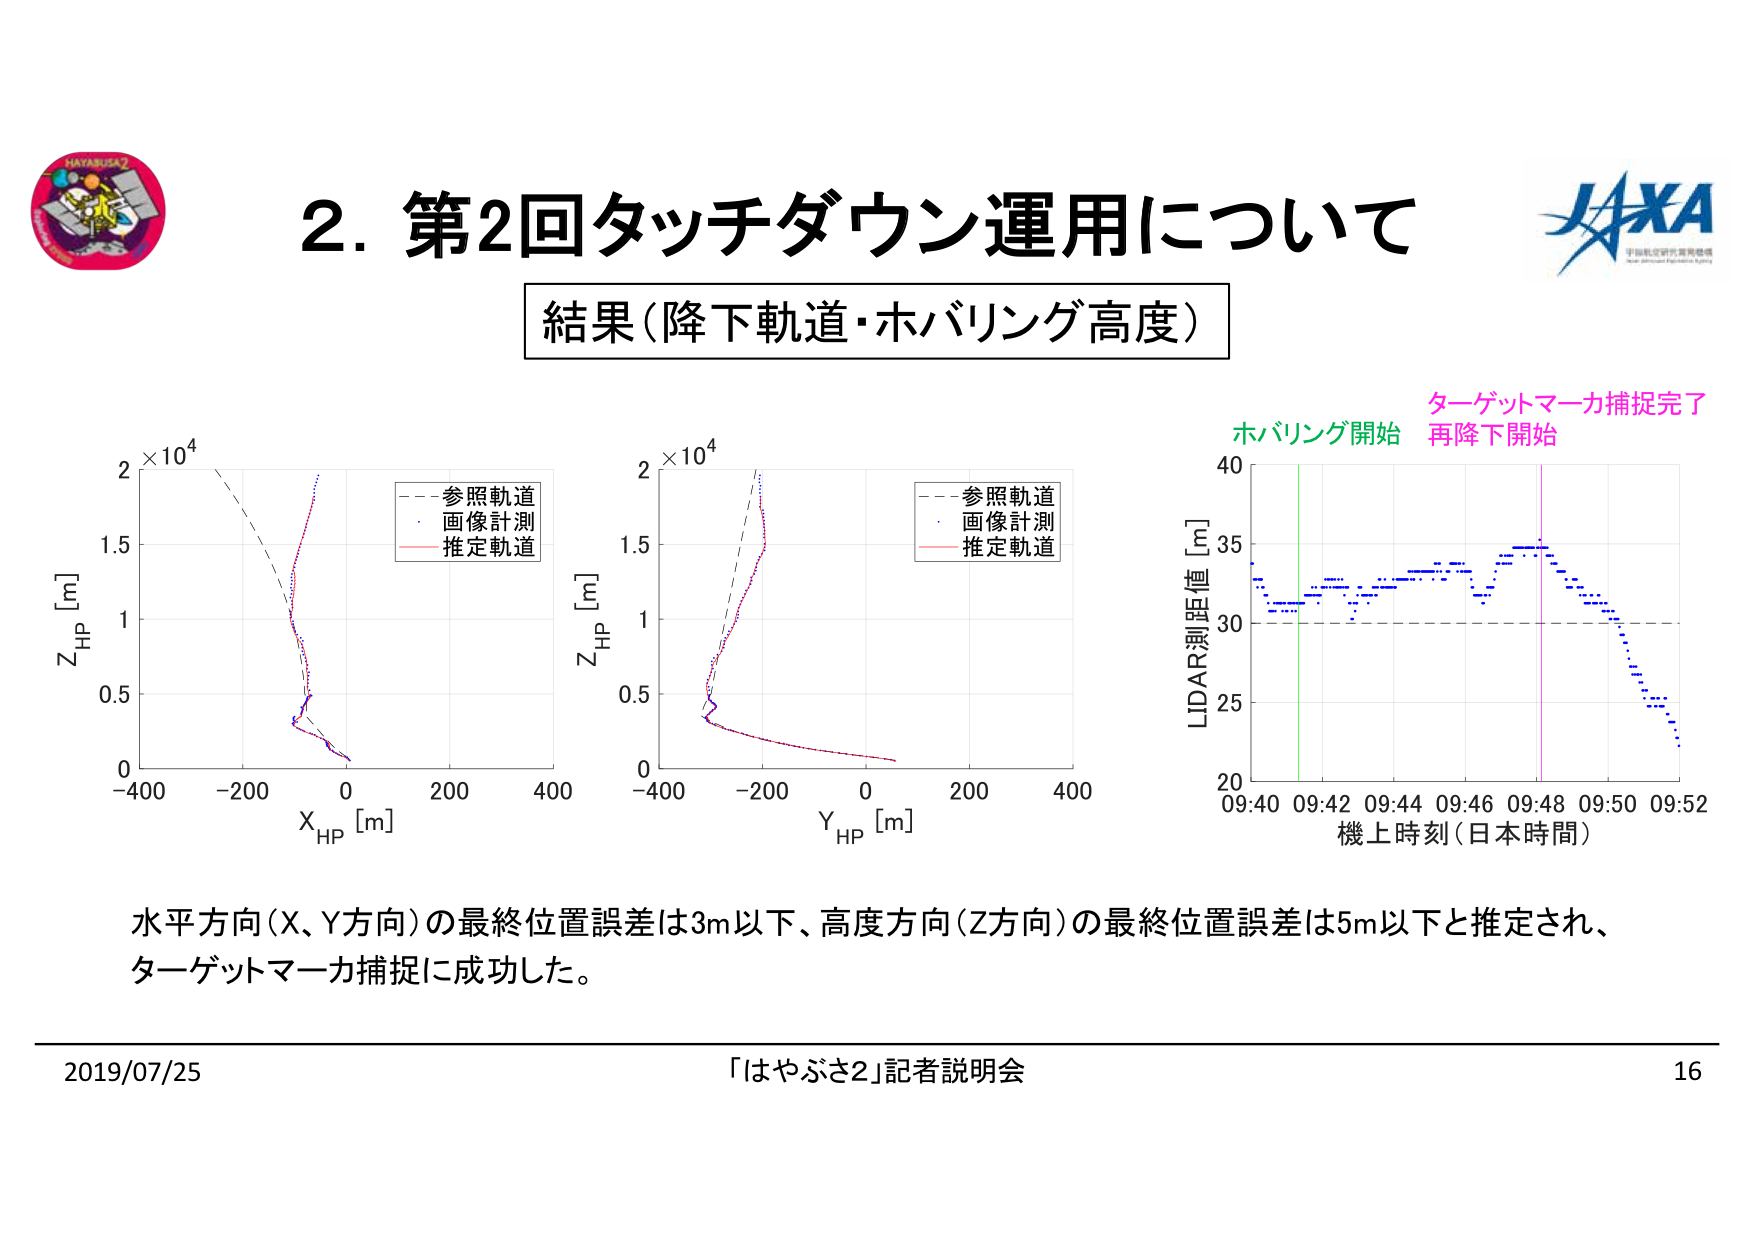 f:id:Imamura:20190725151215p:plain